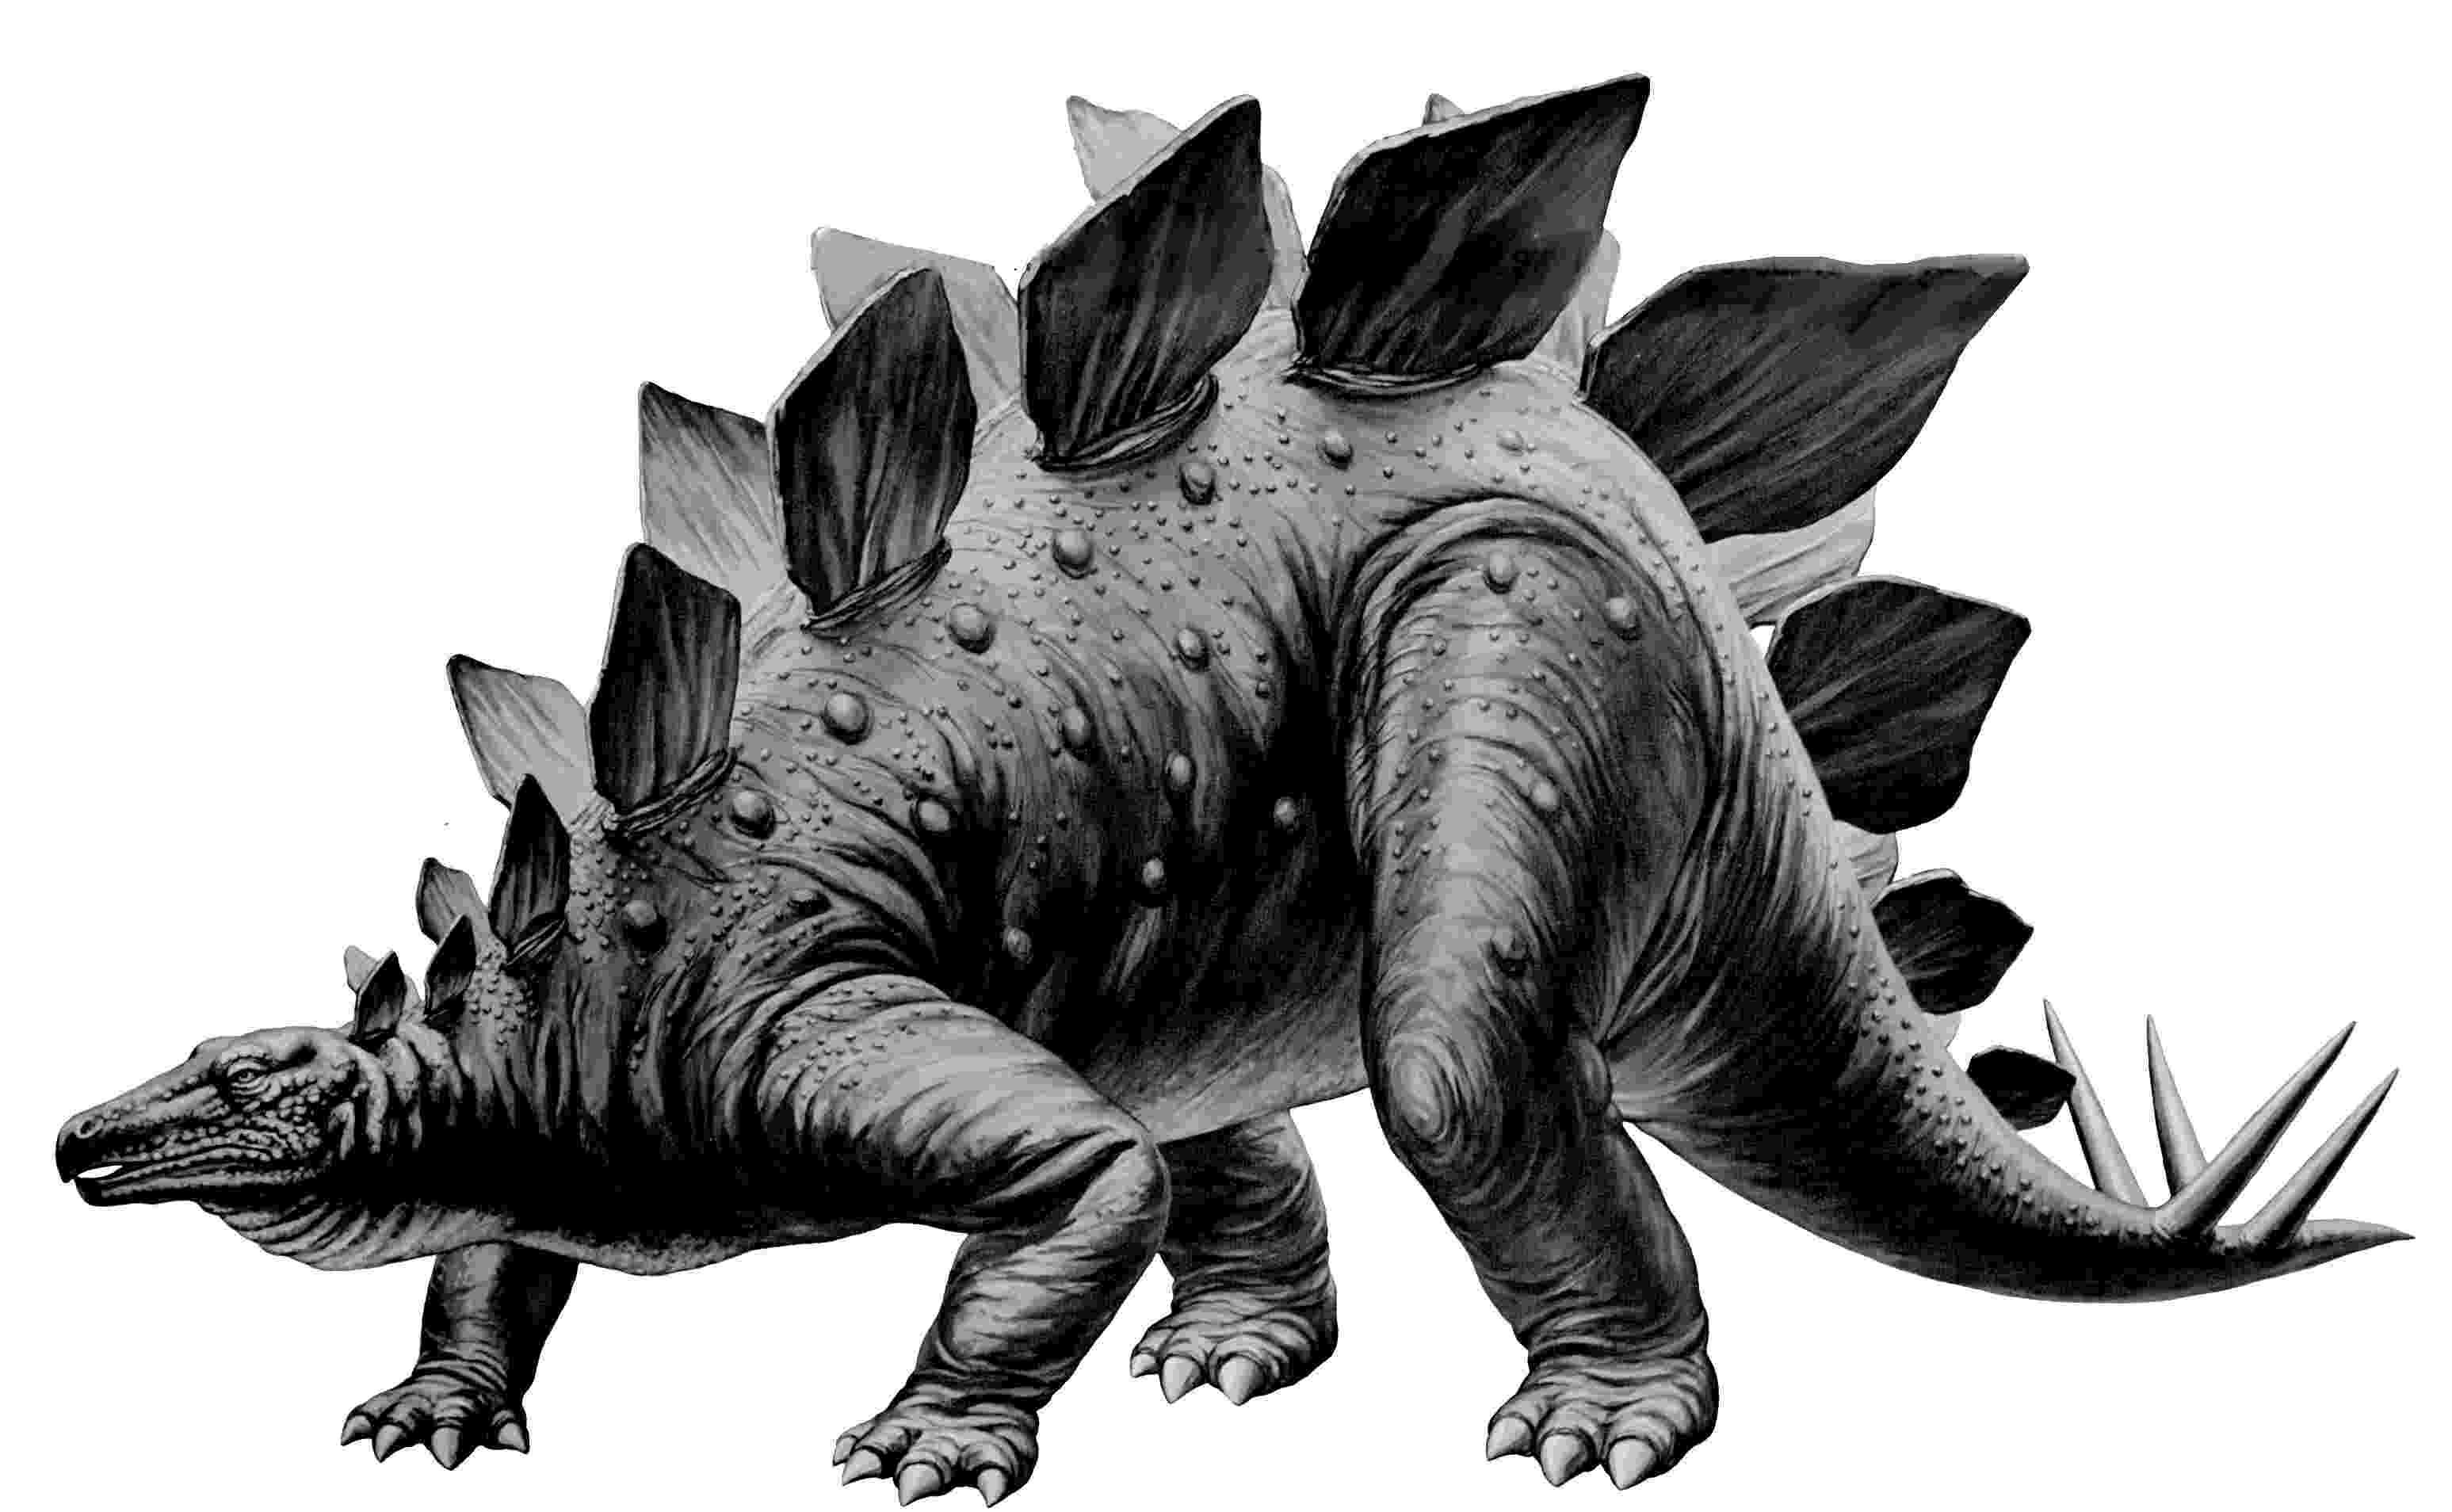 picture of a stegosaurus stegosaurus hd 3d model hum3d stegosaurus a picture of